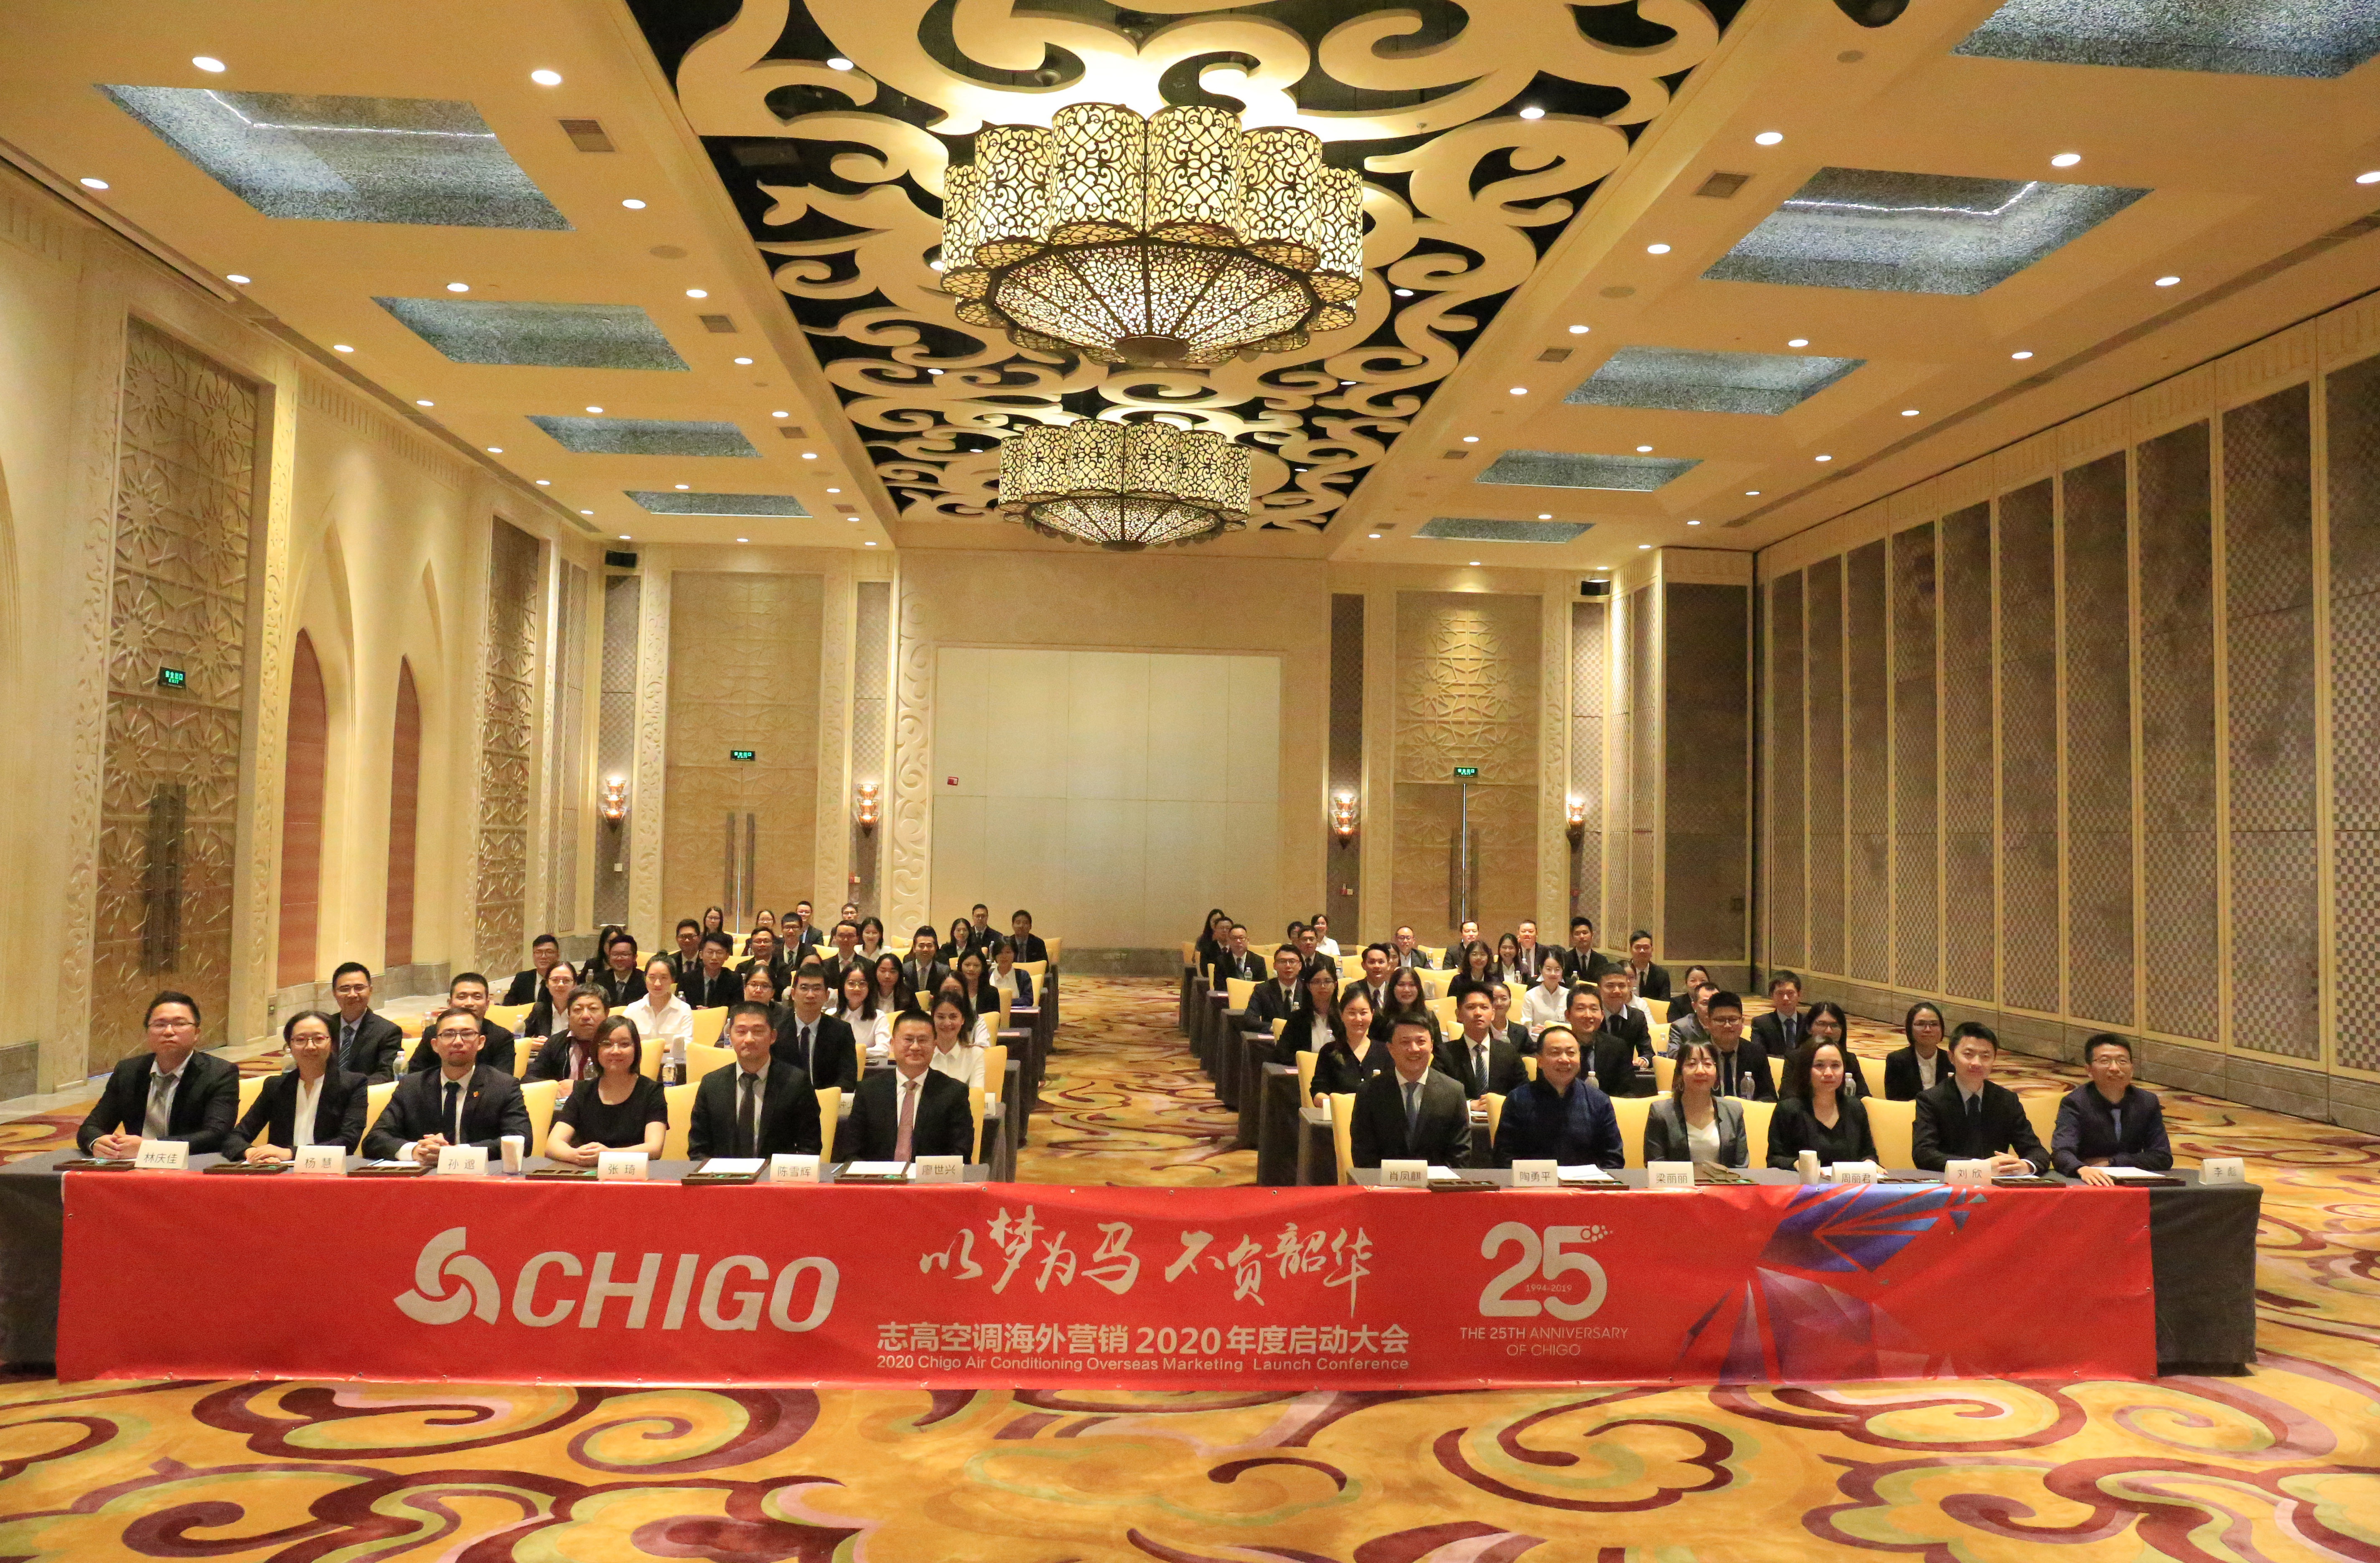 CHIGO held 2020 Overseas Marketing Launch Conference